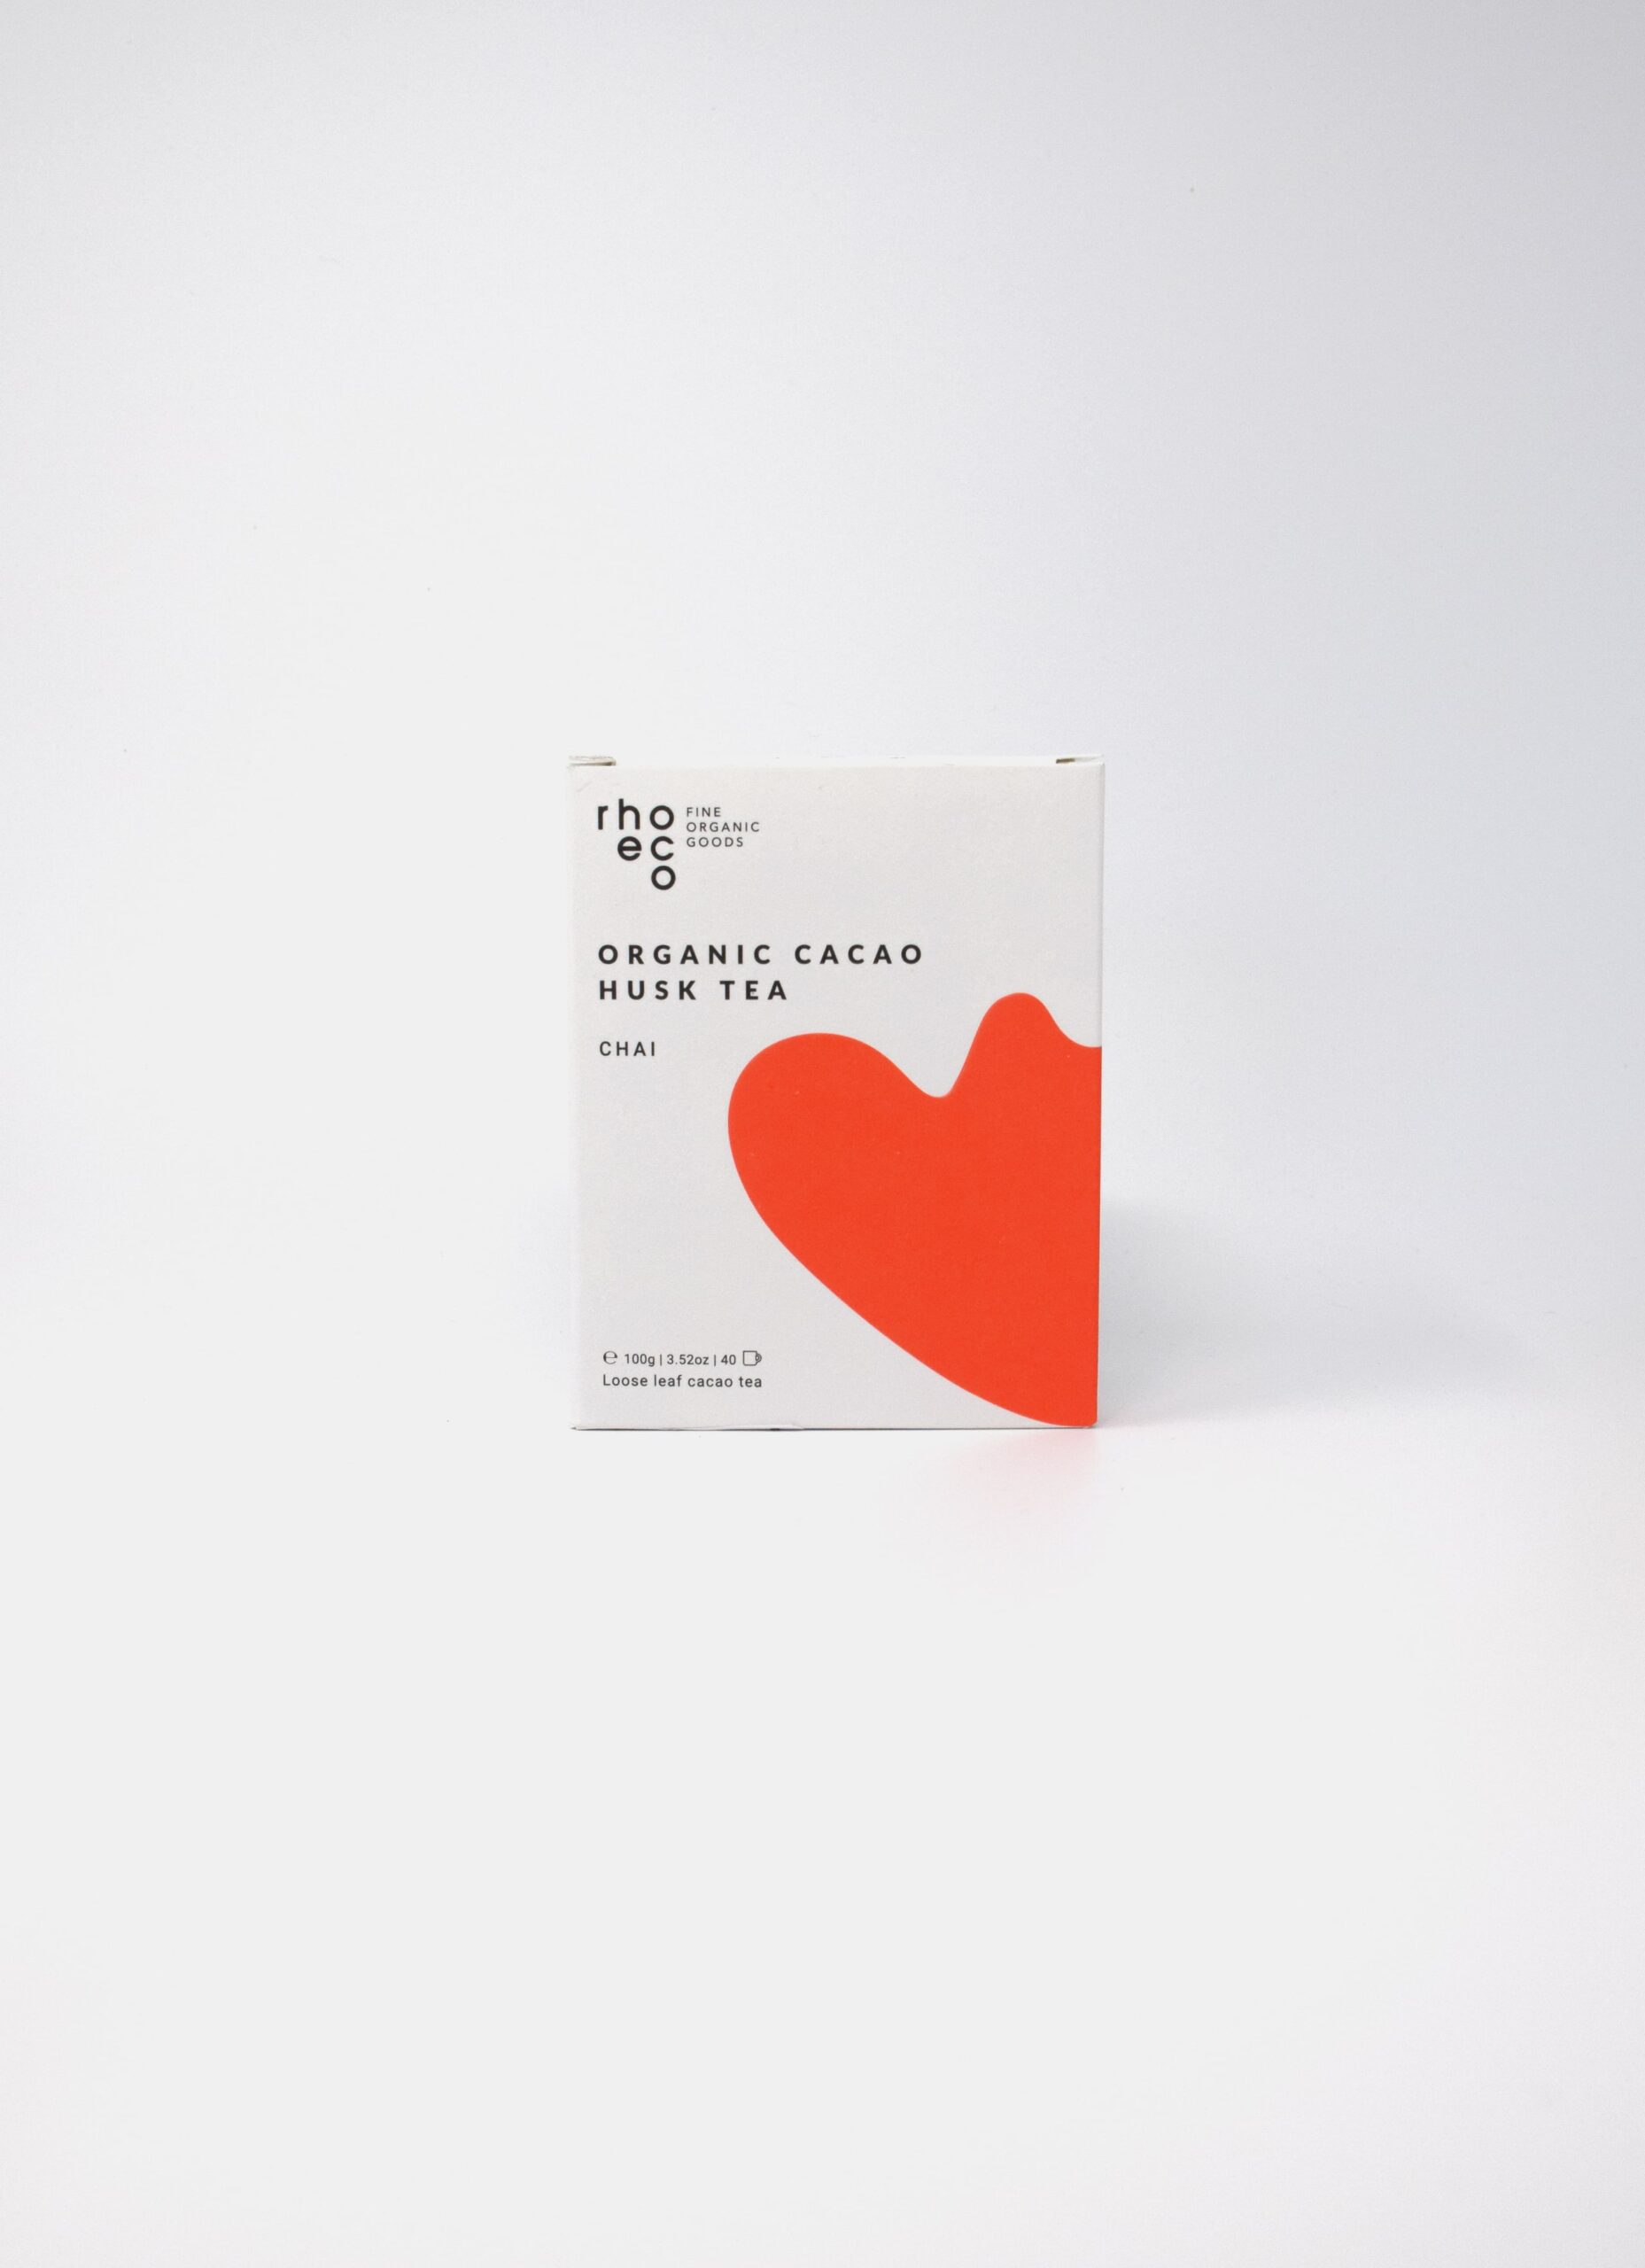 Rhoeco - Organic Cacao Husk Tea - Chai - 100g